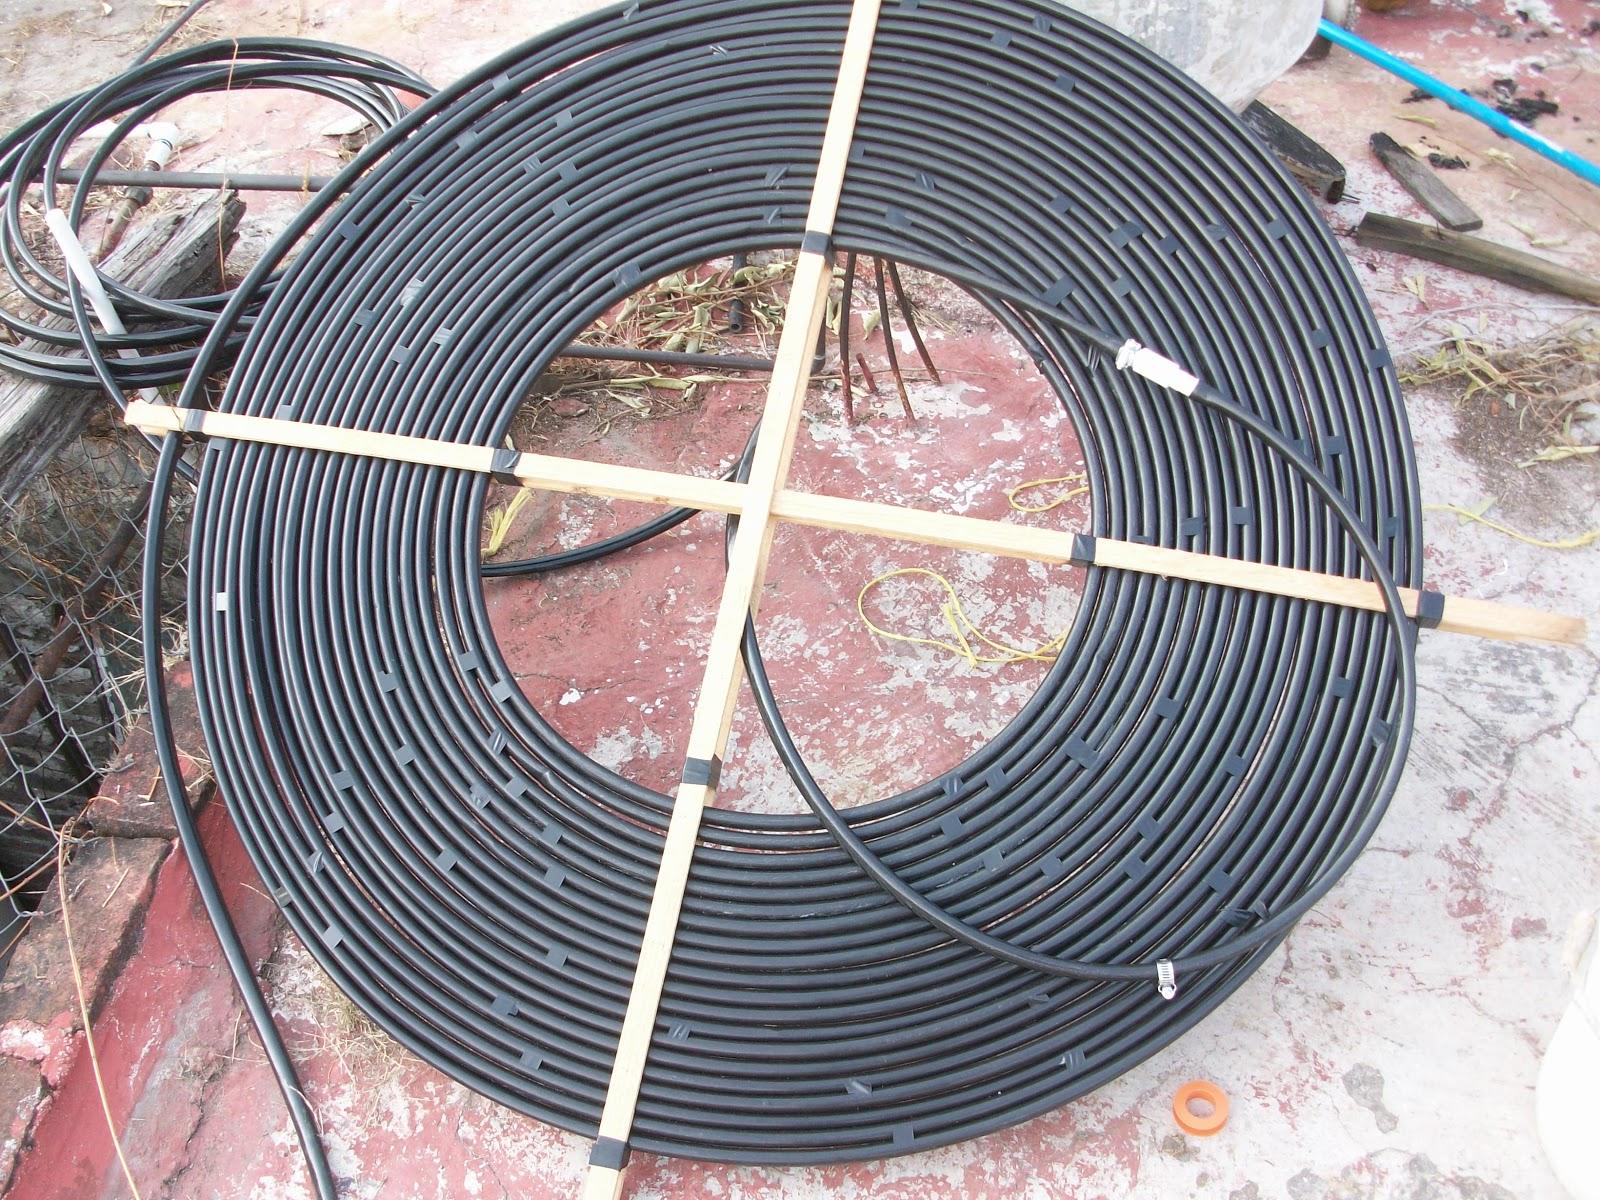 Aire acondicionado split calentones caseros for Fabricar piscina barata